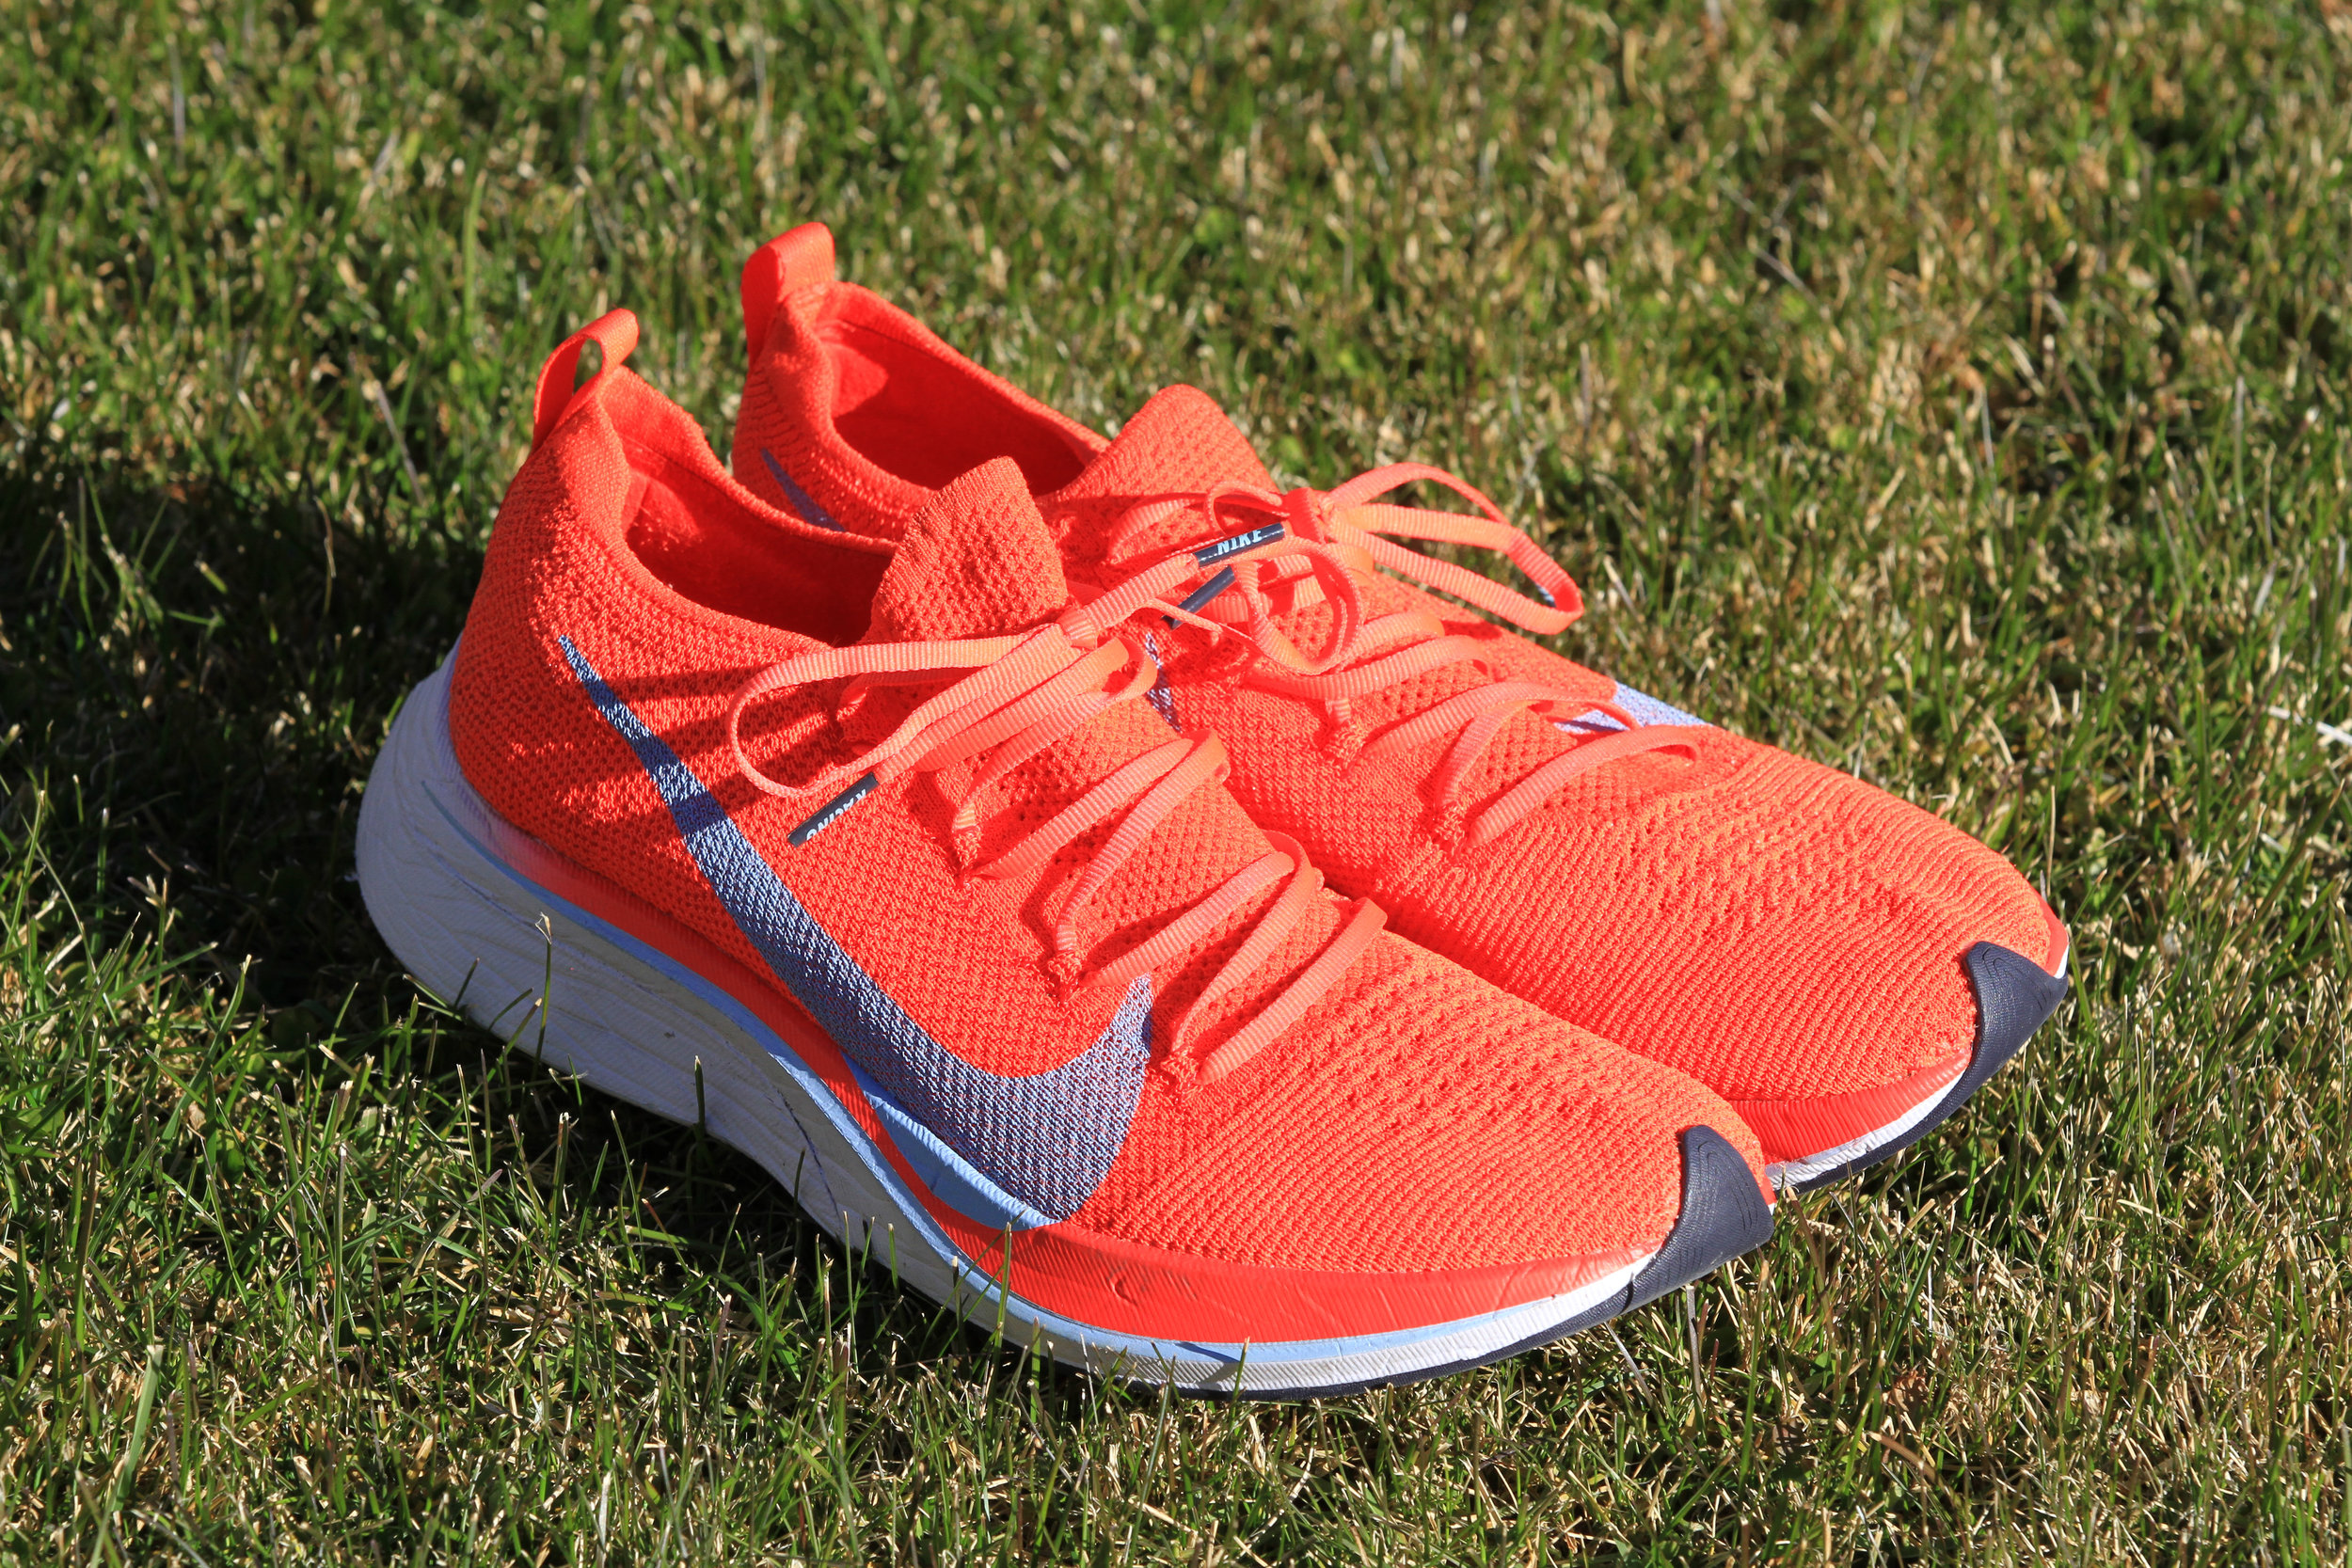 REVIEW: Nike Vaporfly 4% Flyknit